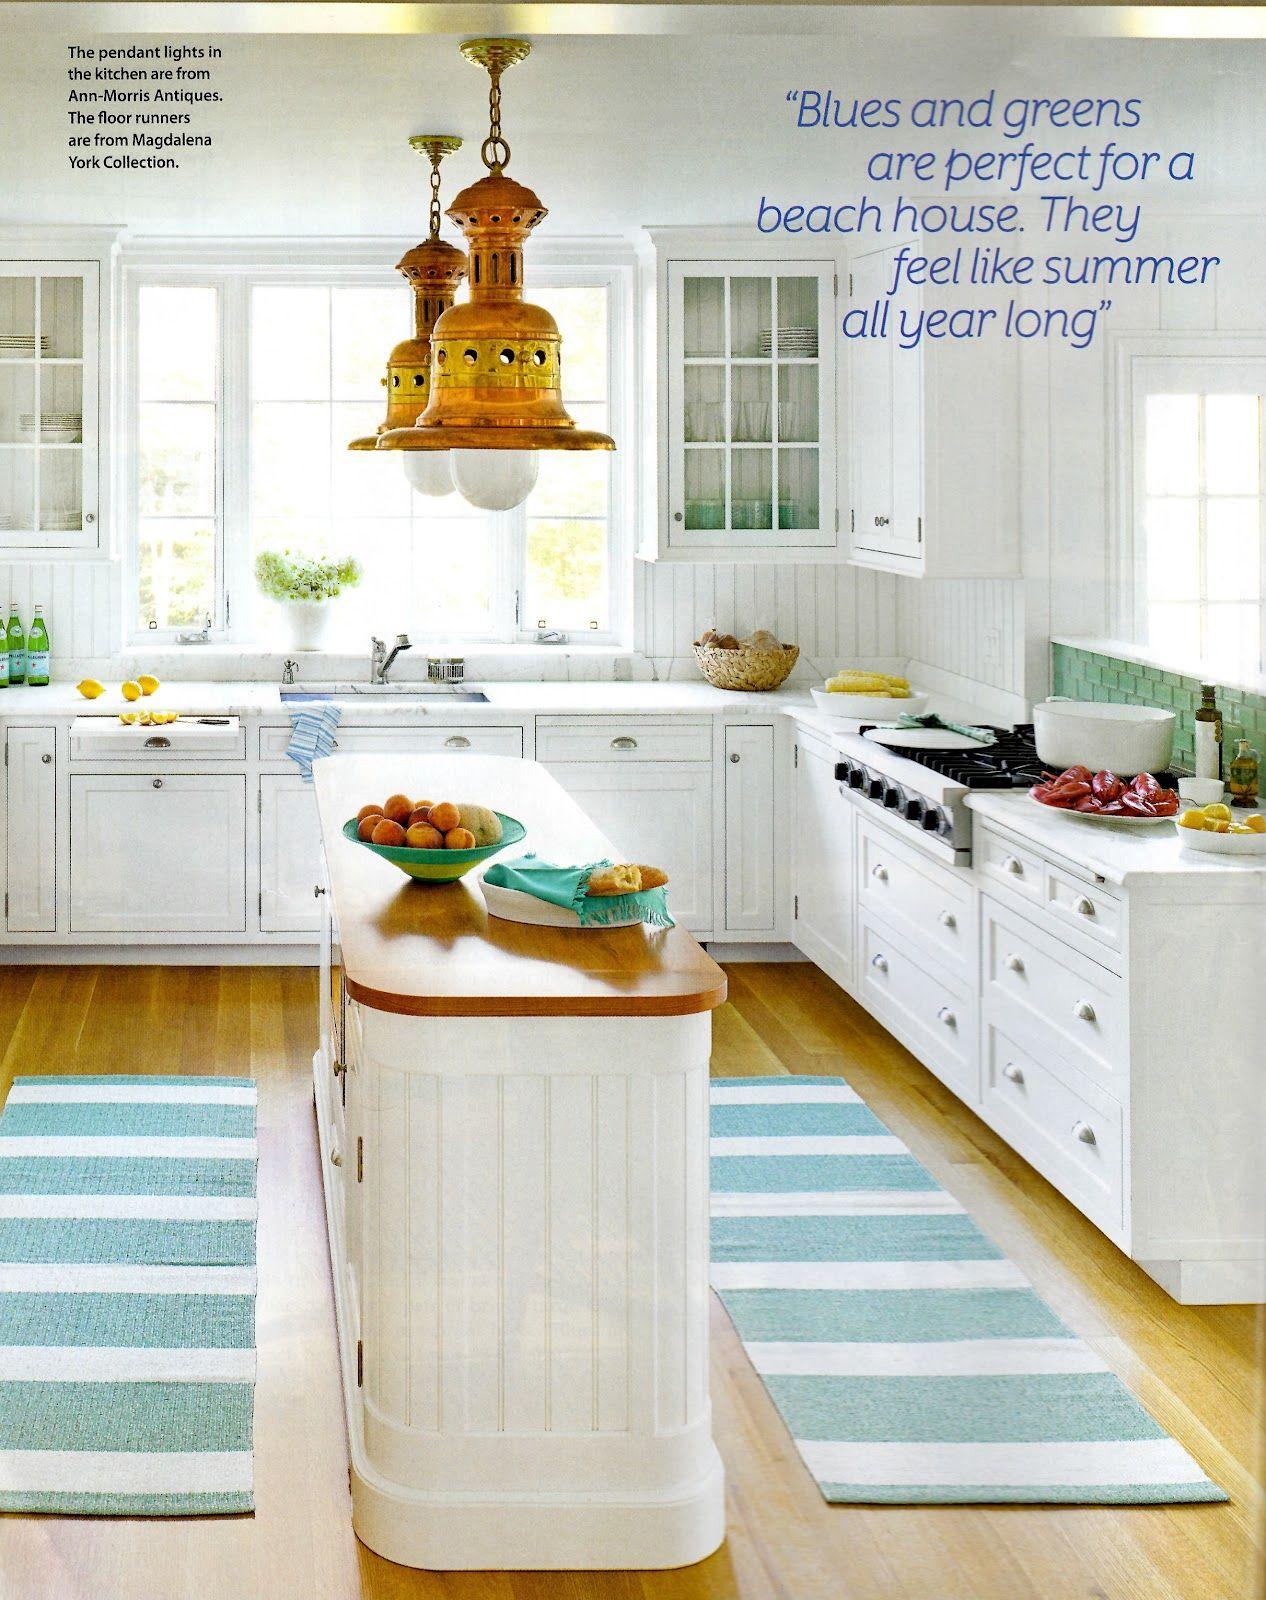 Good beachhouse kitchen islandahemmom for the home